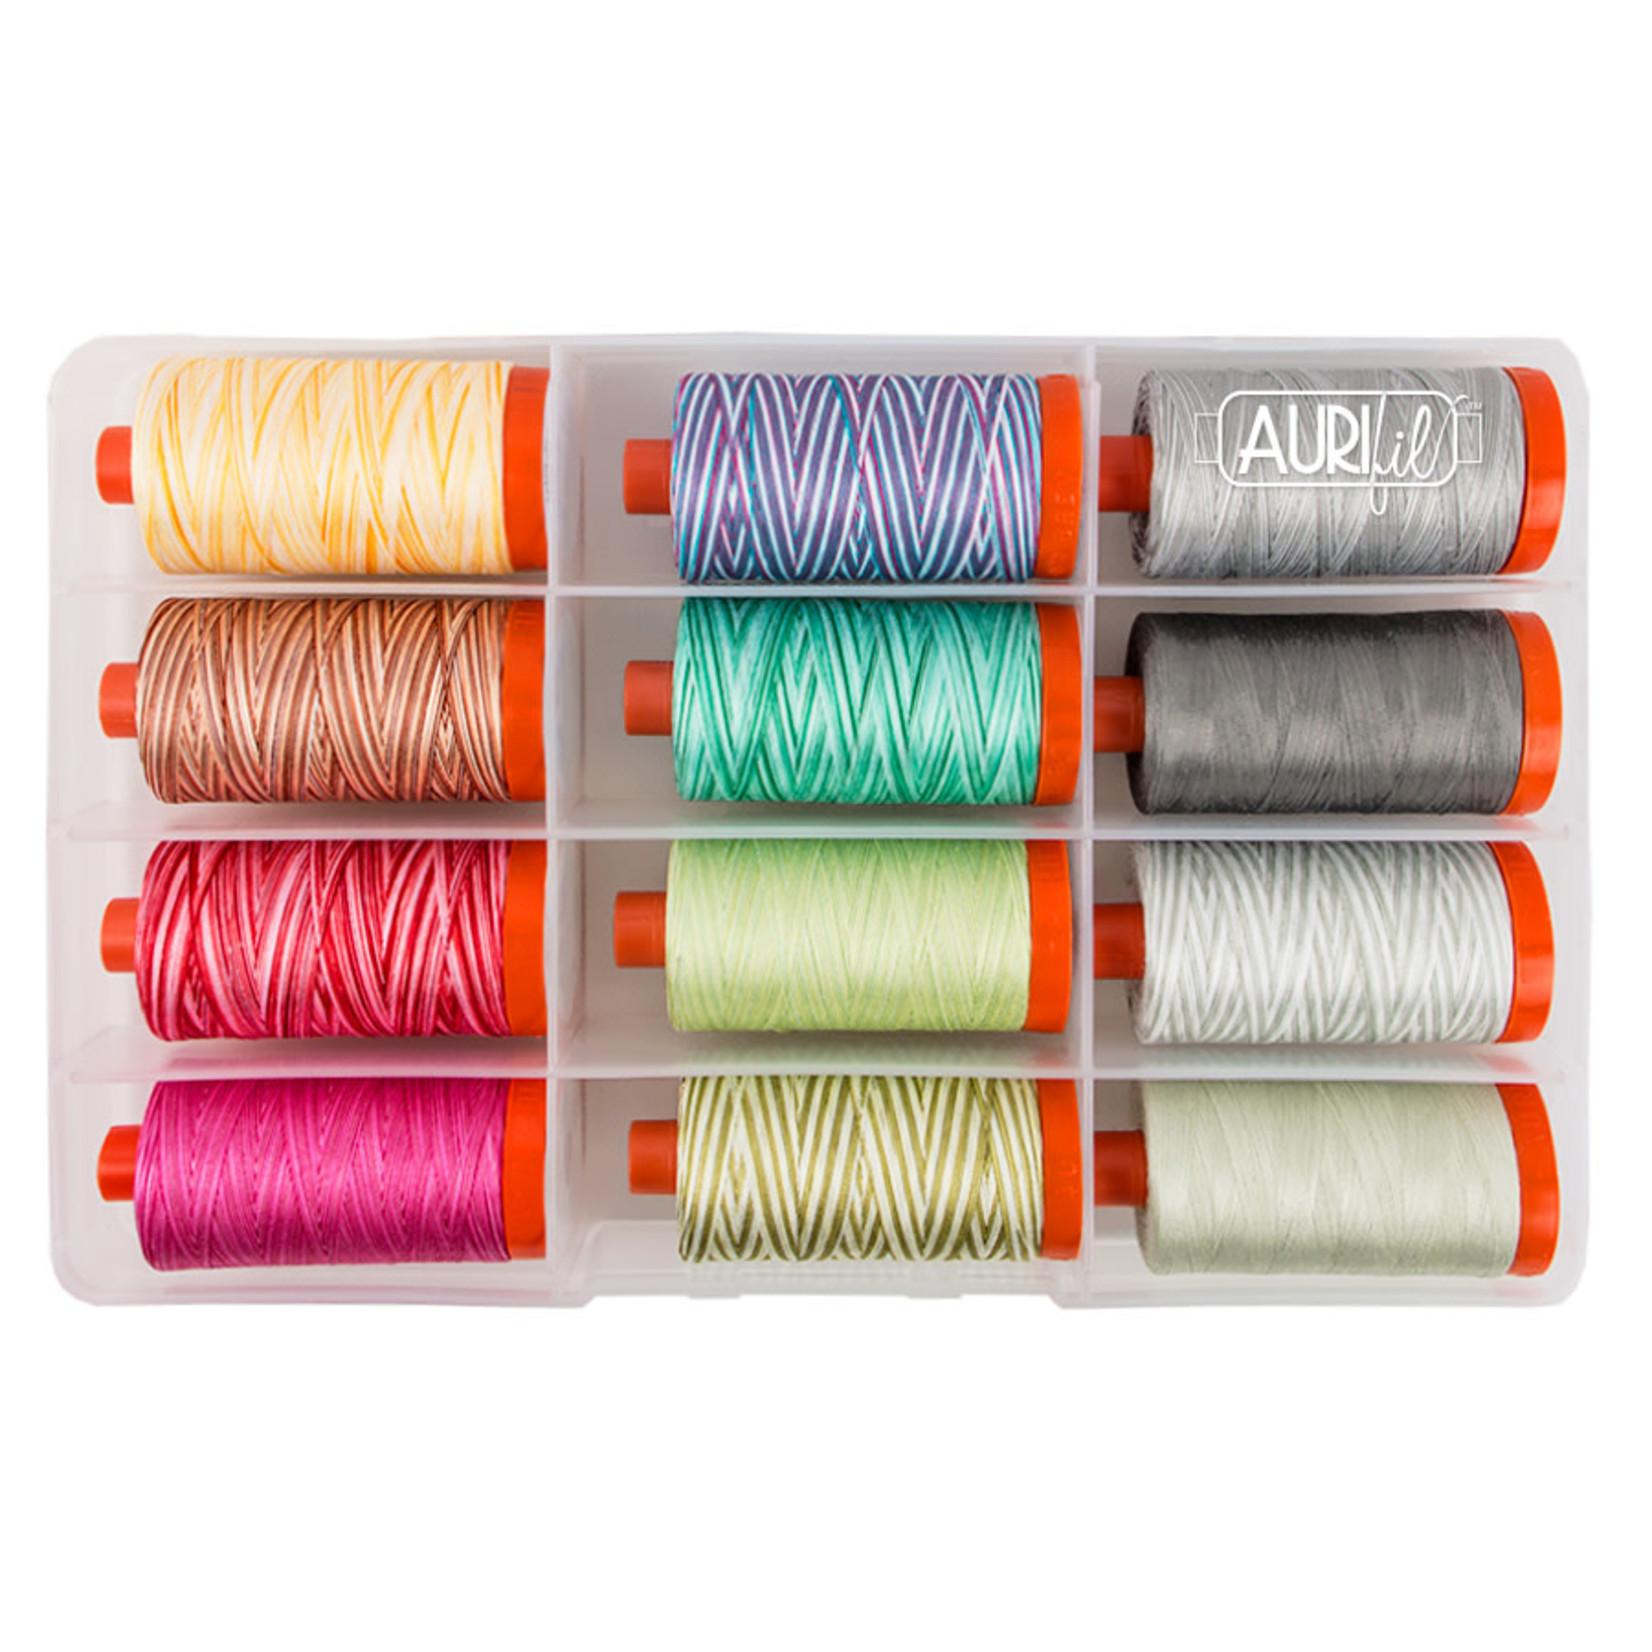 Tula Pink Tula Pink Premium Large Spool Thread Collection